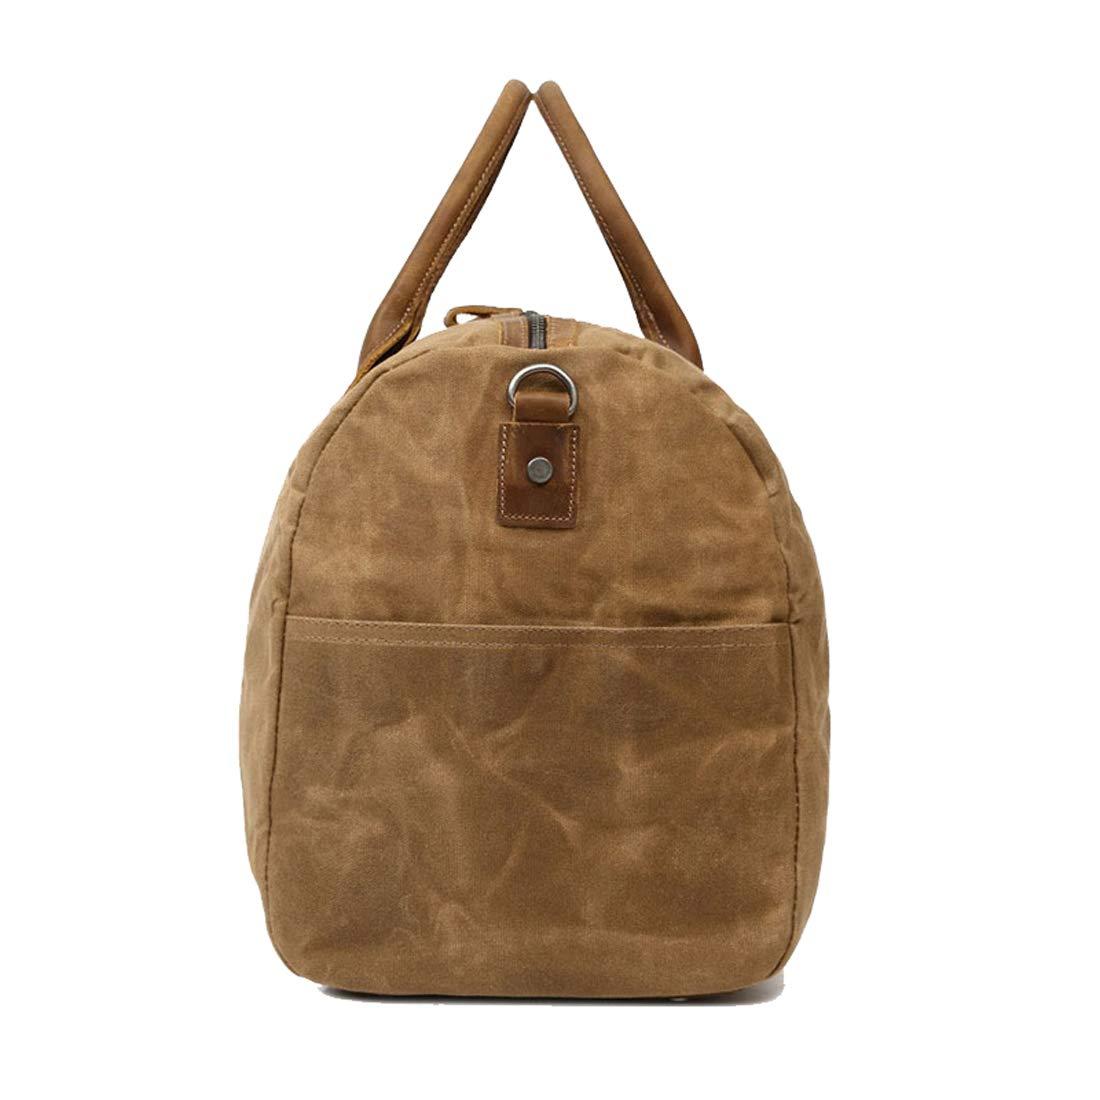 Berchirly Travel Duffel Bag Large Canvas Sports Hand Bags Vintage Weekender Luggage Bag